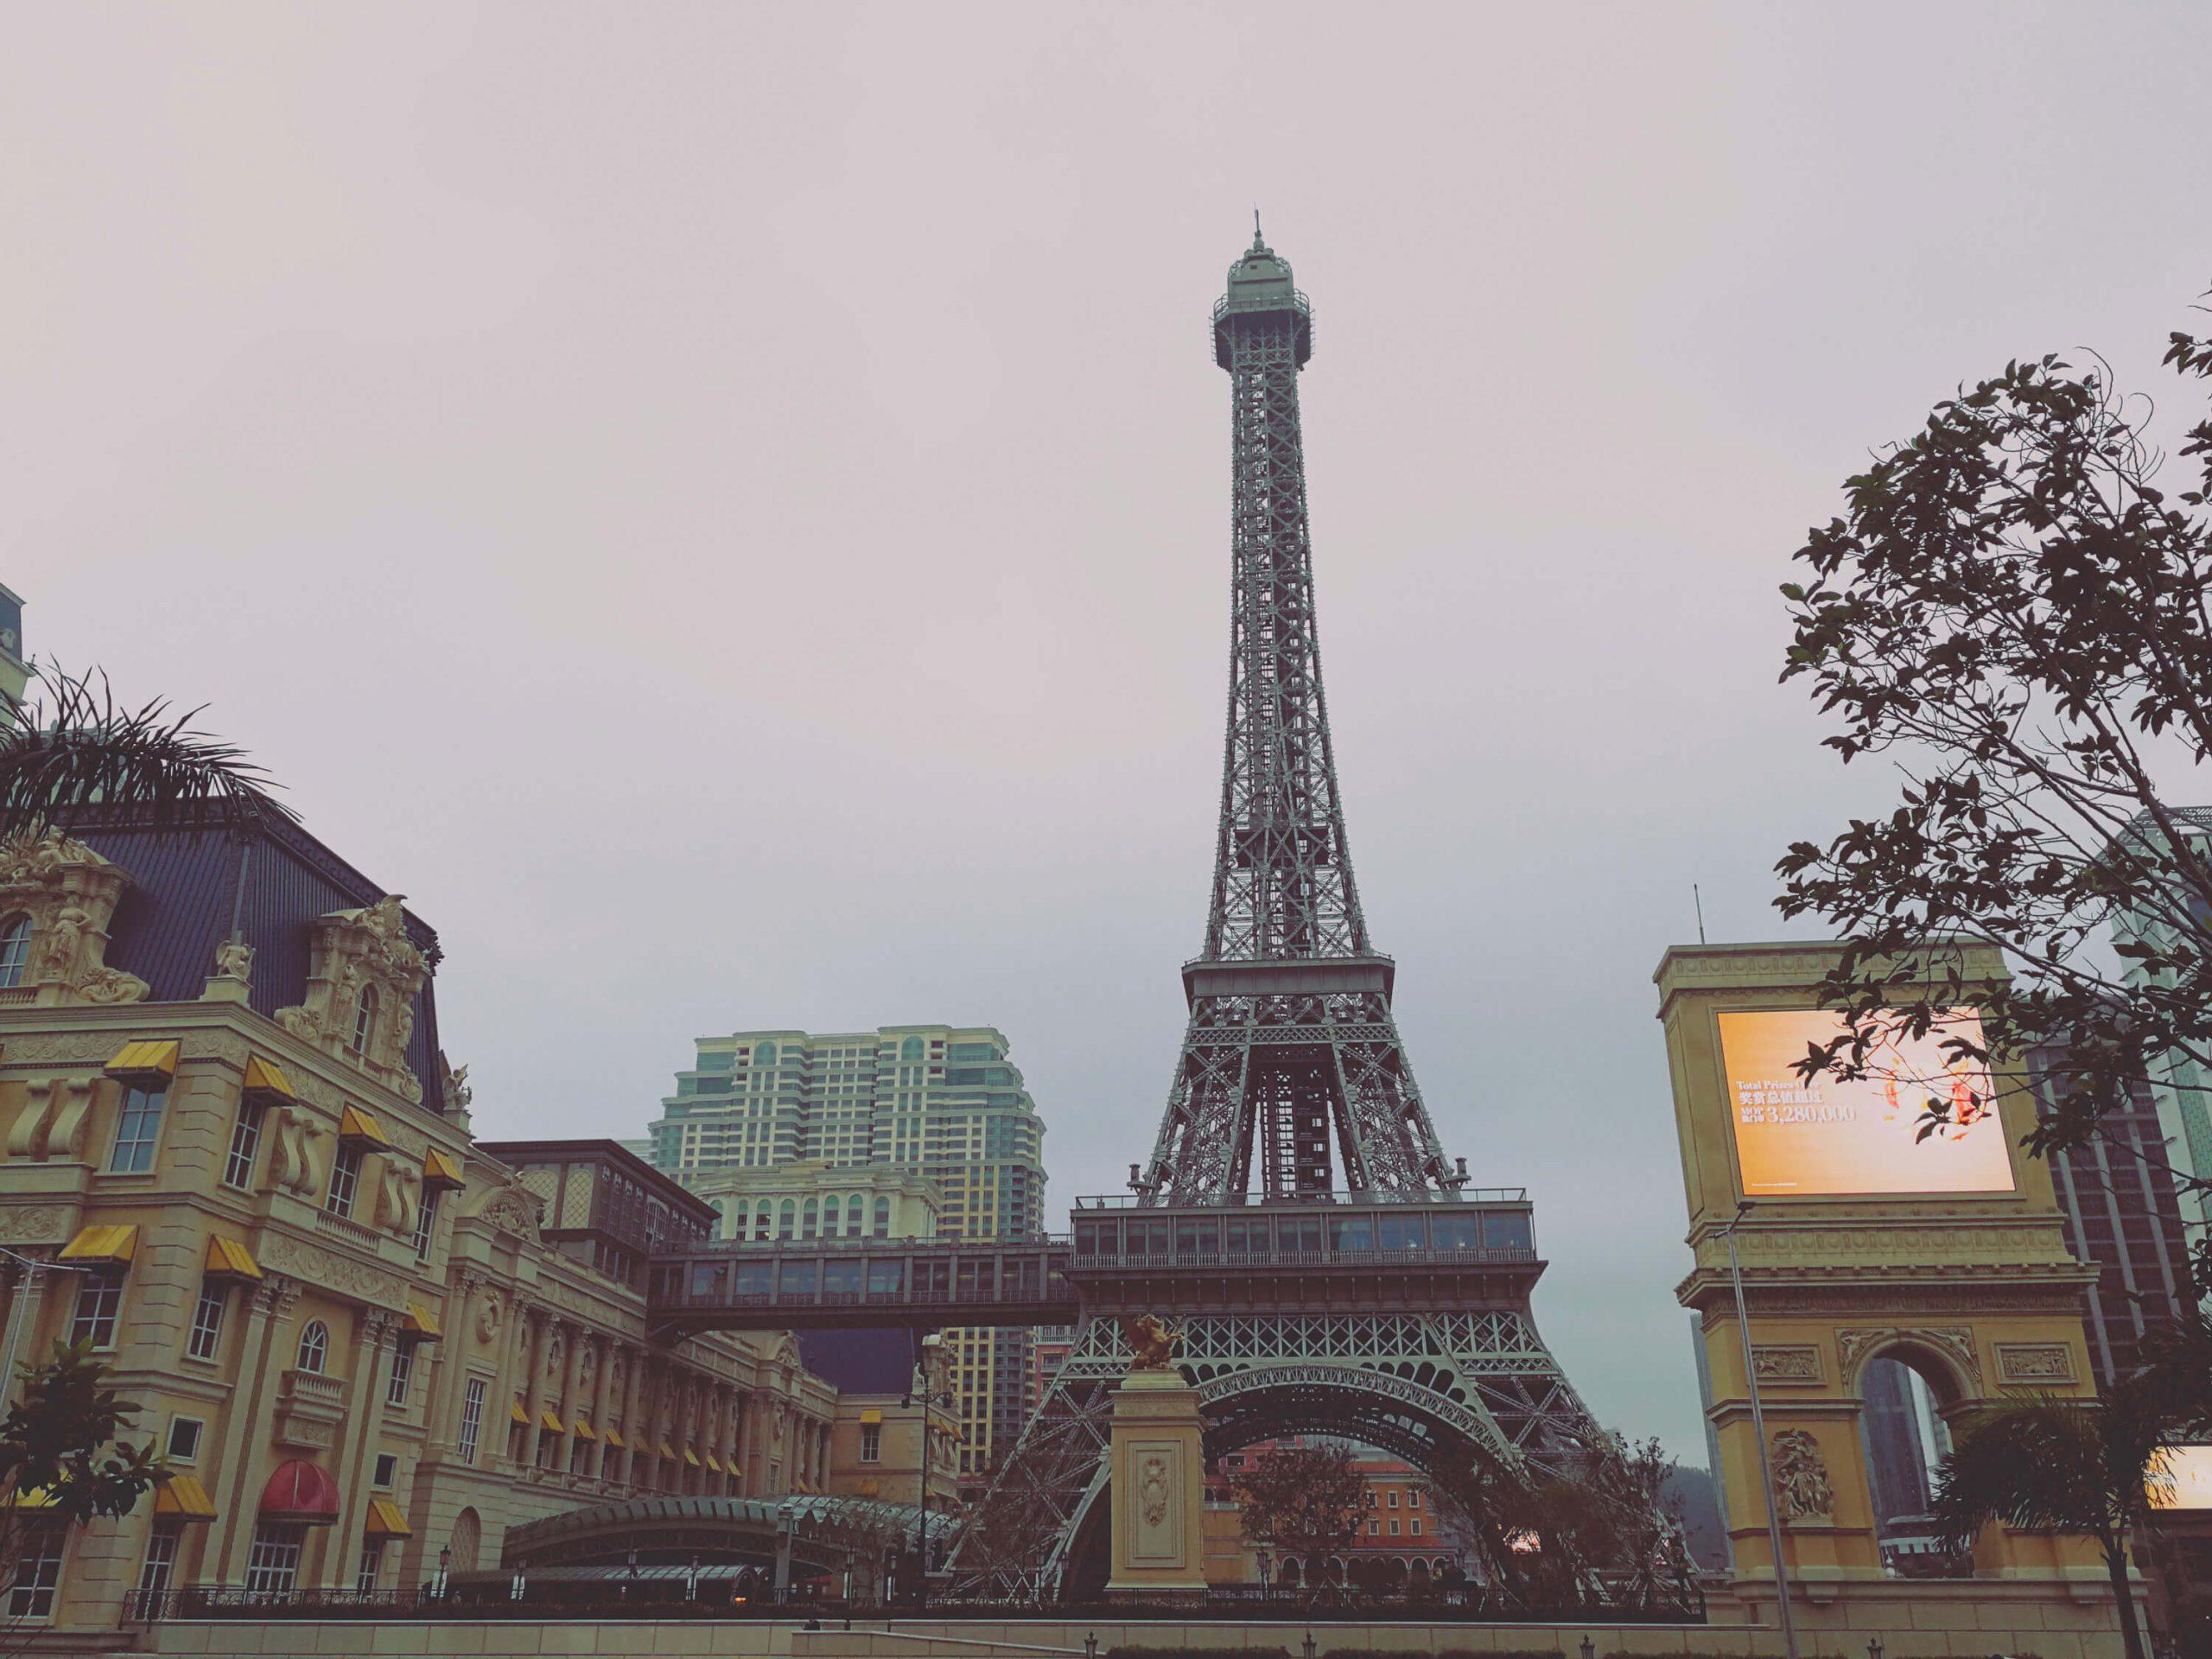 Macau Parisian Eiffel Tower